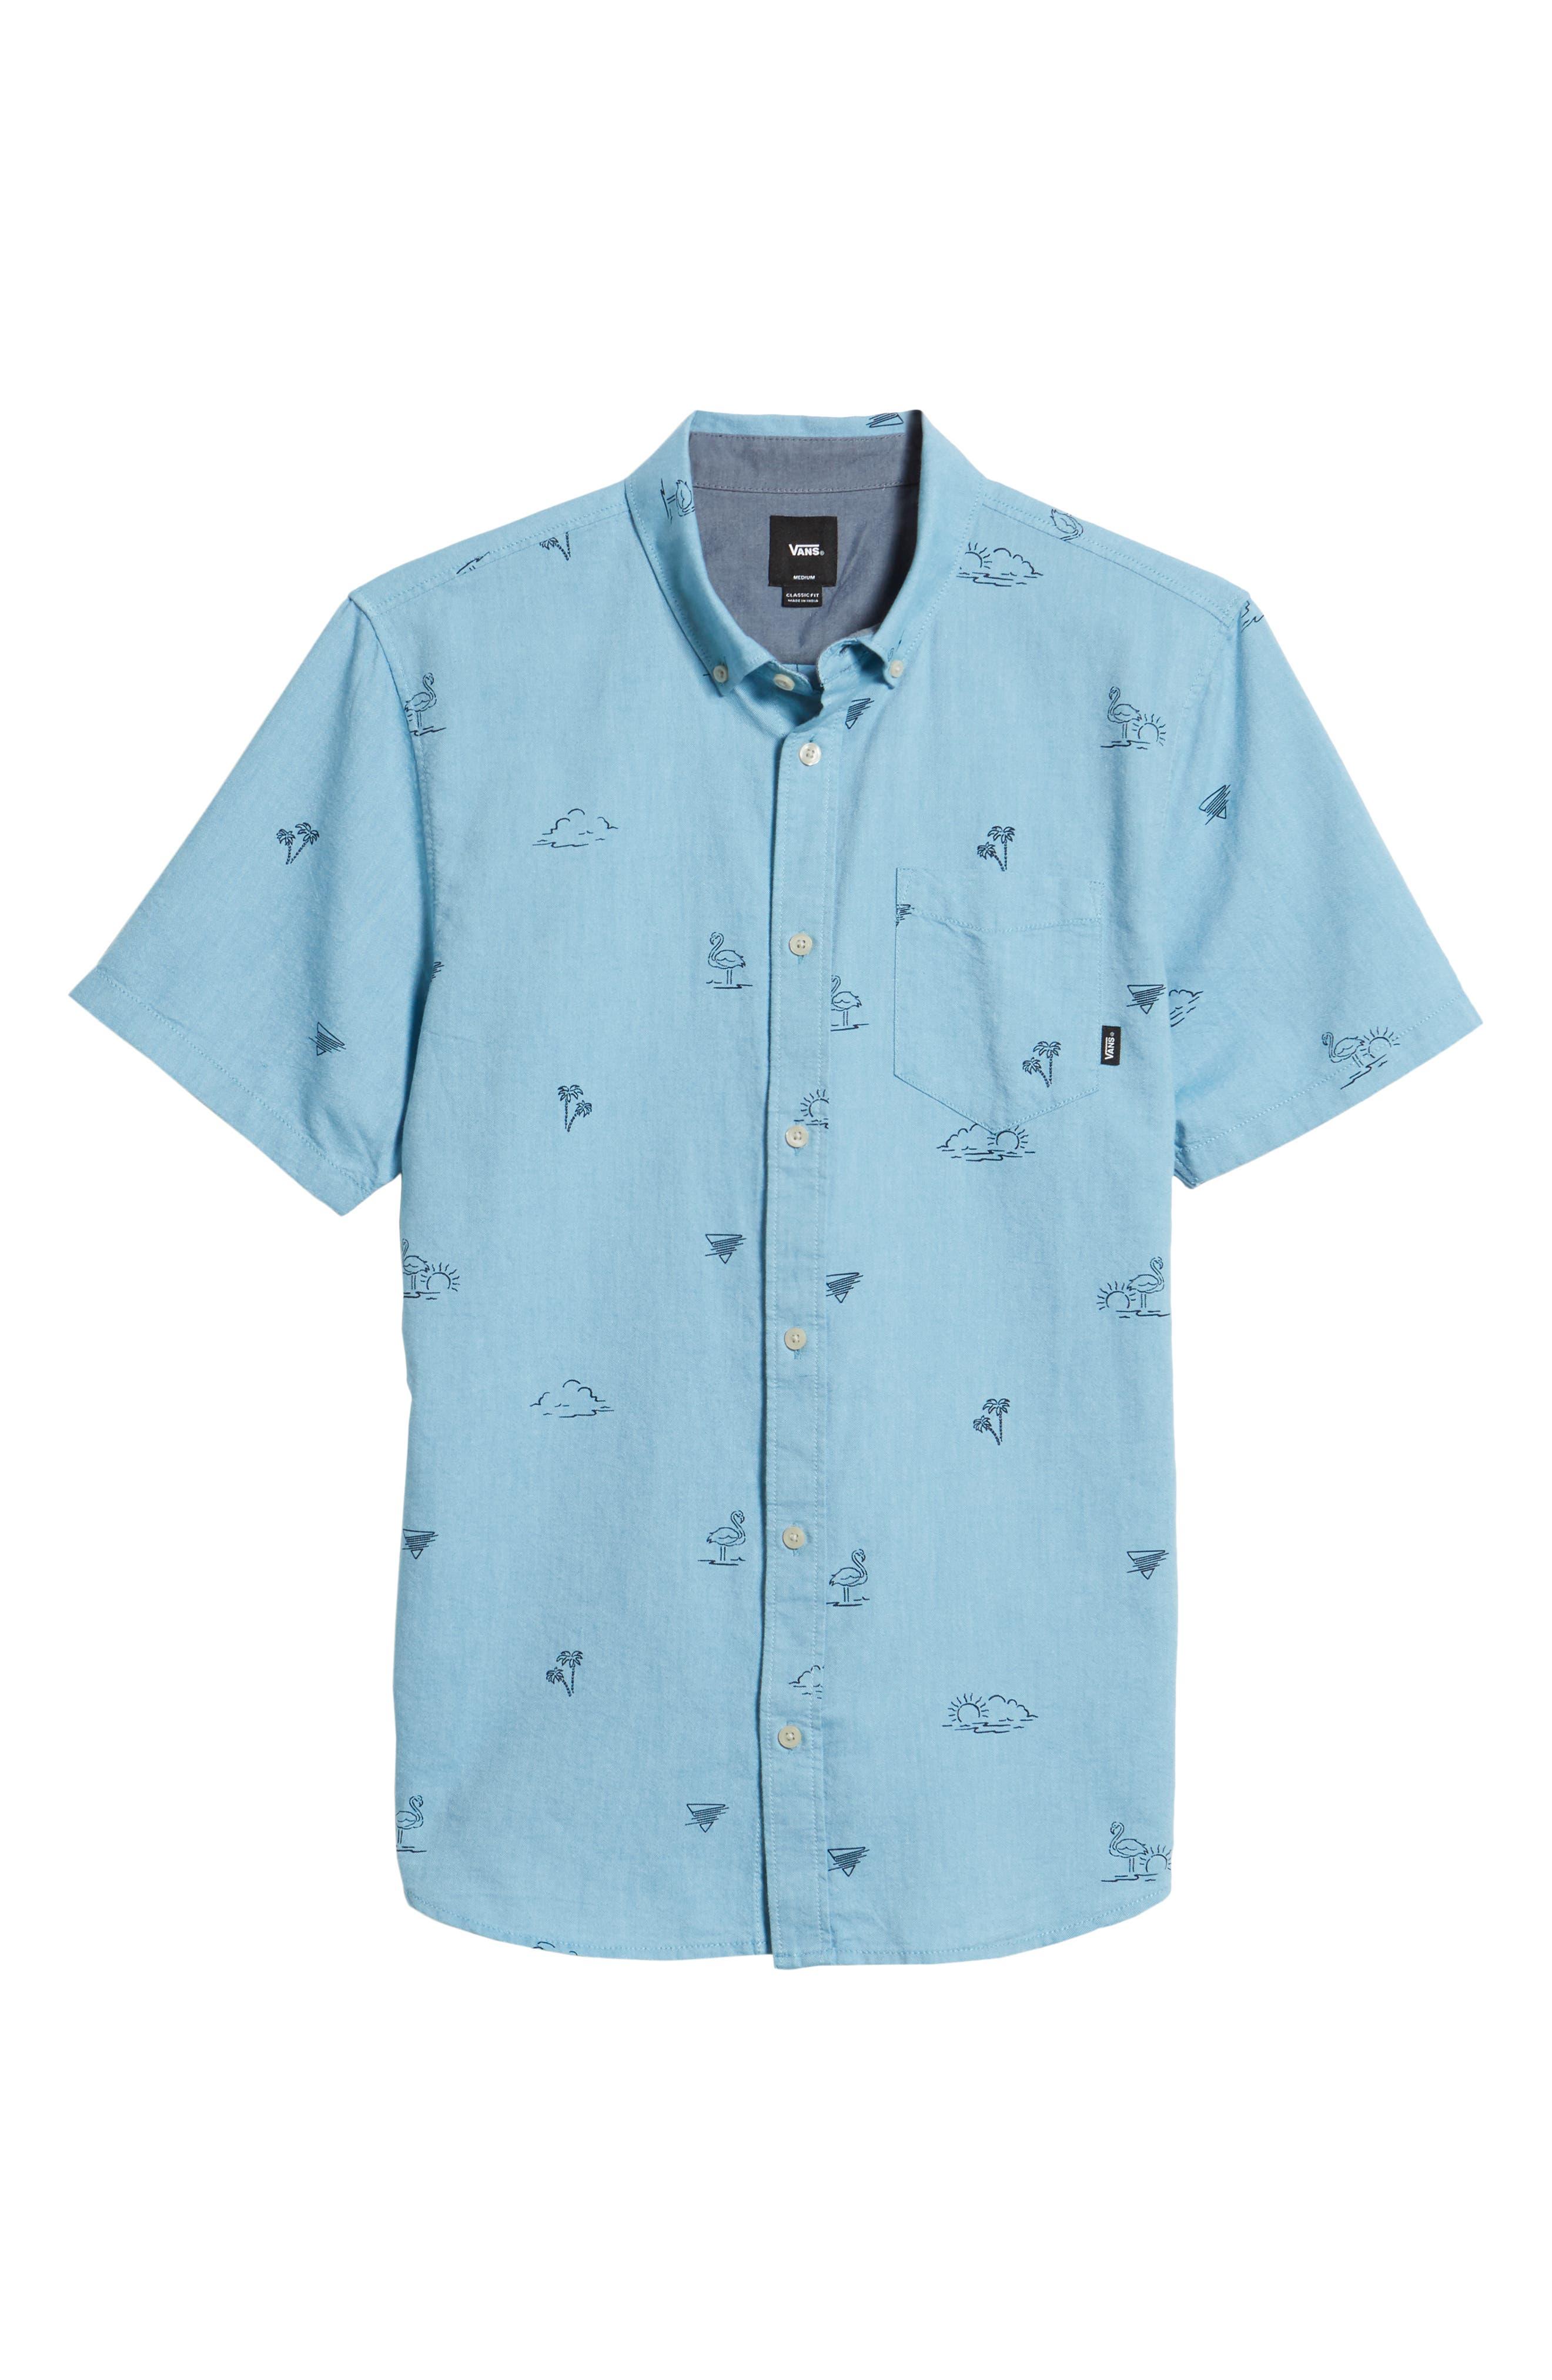 Houser Woven Shirt,                             Alternate thumbnail 6, color,                             Blue Moon Road Trippin